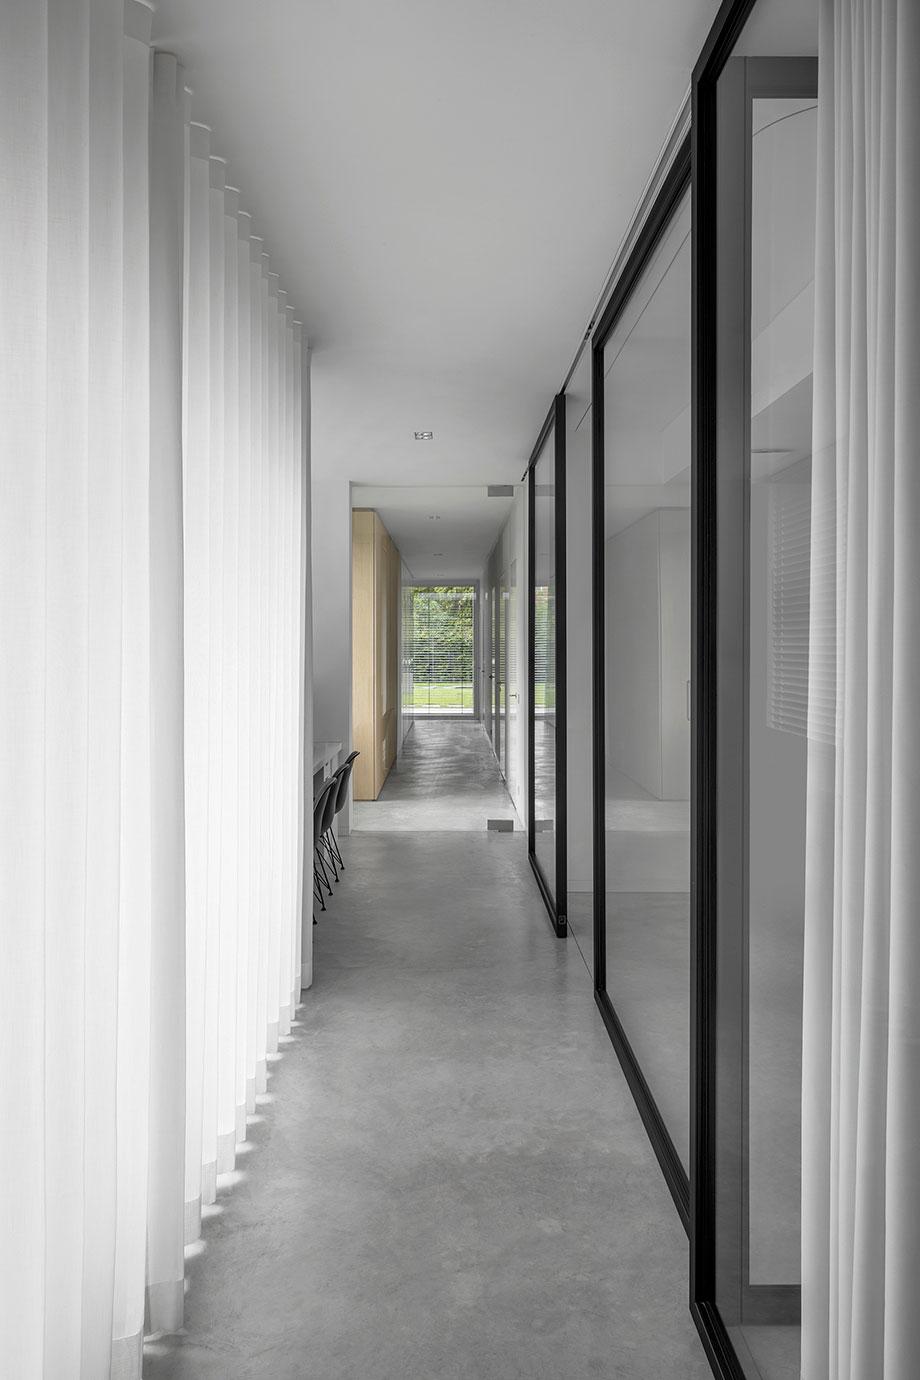 casa de i29 y bedaux de brouwer (5) - foto ewout huibers